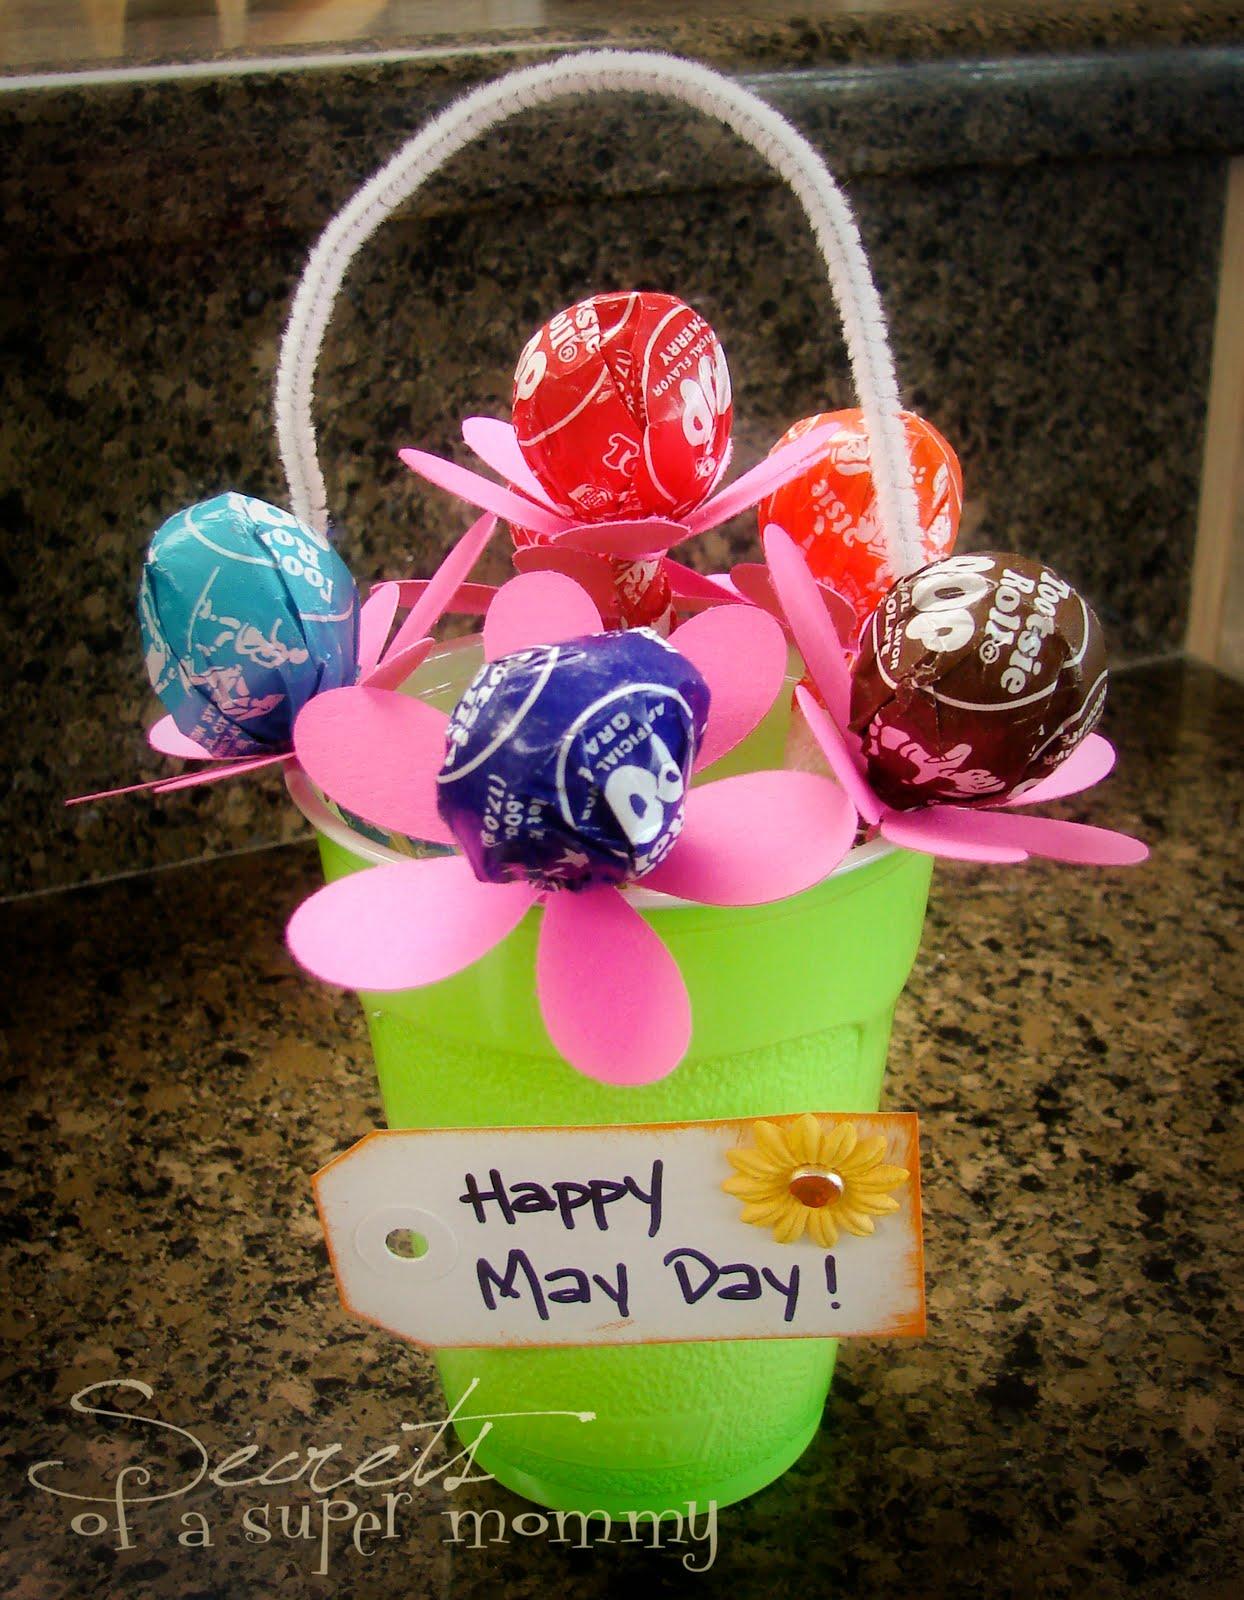 Secrets of a Super Mommy May Day Baskets for Friends : DSC056675B15Dcc from secretsofasupermommy.blogspot.com size 1244 x 1600 jpeg 262kB